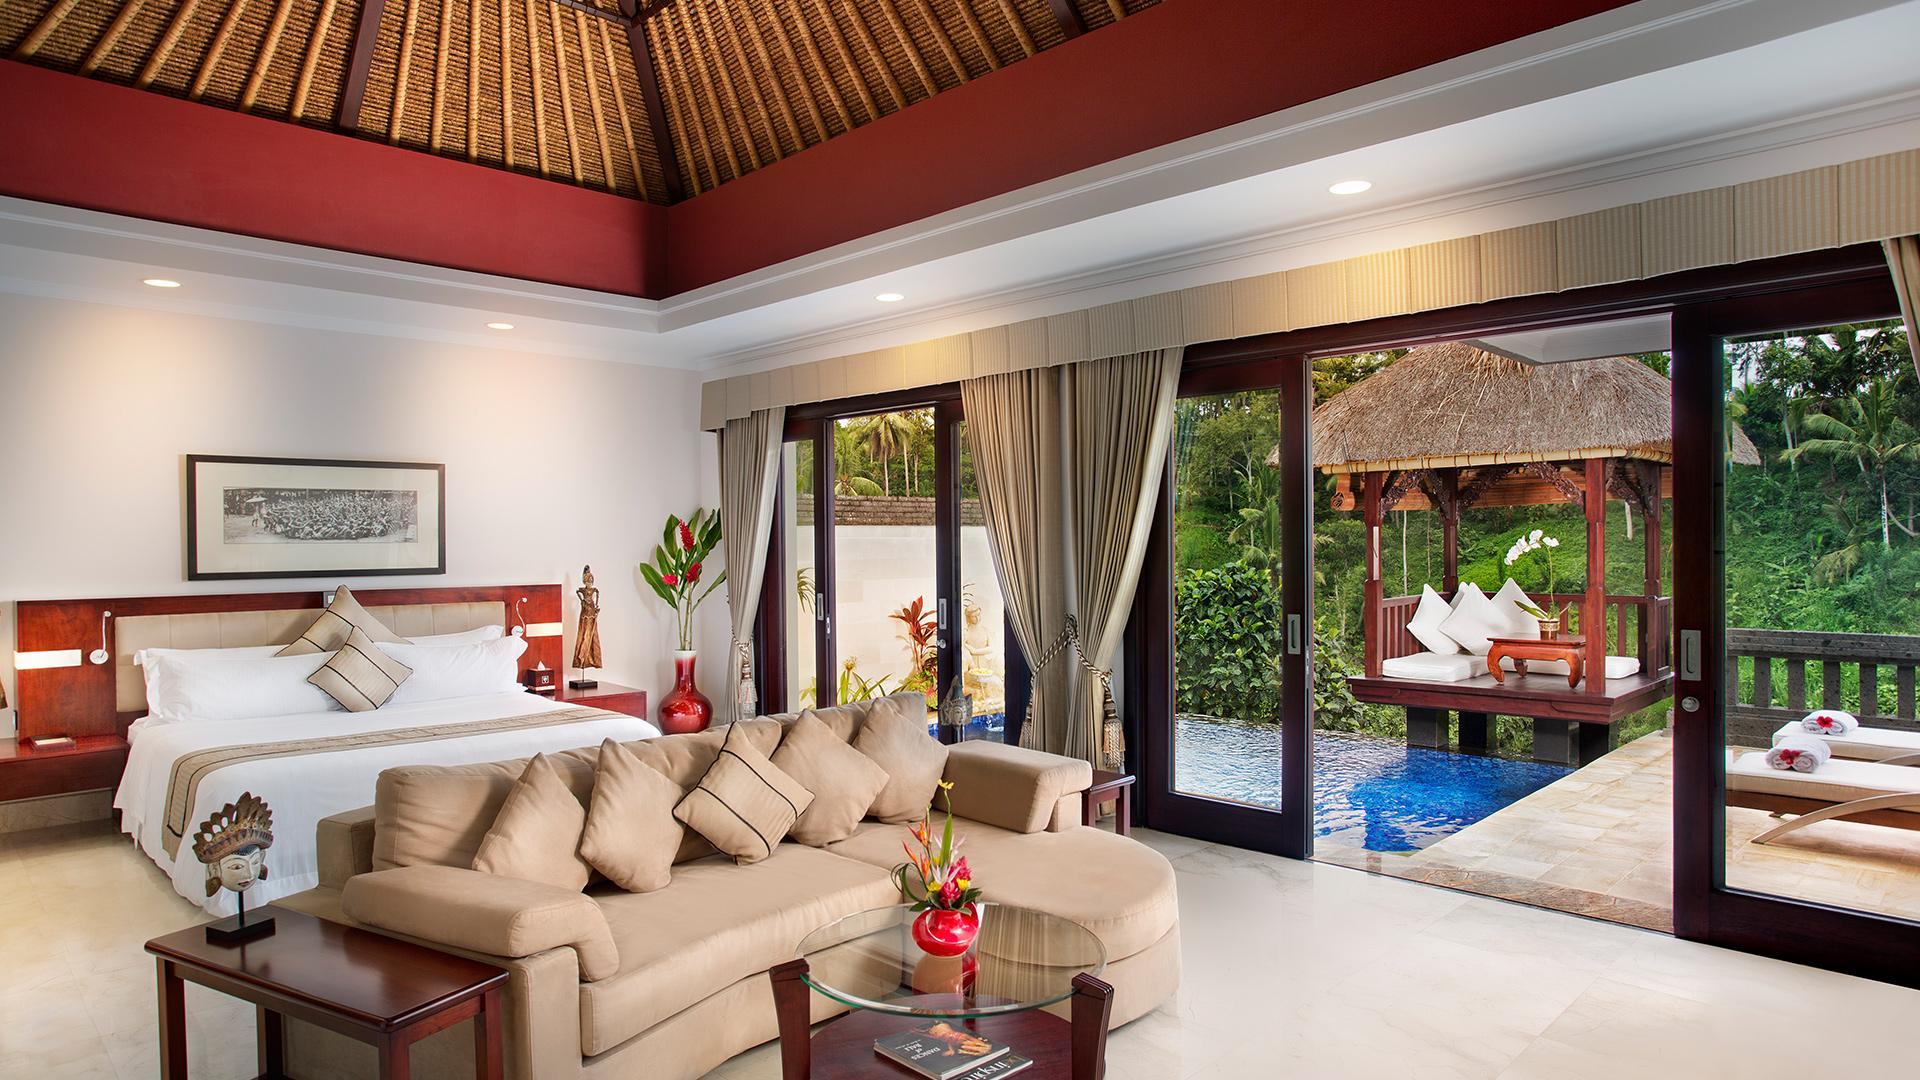 Deluxe Terrace Villa image 1 at Viceroy Bali by Kabupaten Gianyar, Bali, Indonesia